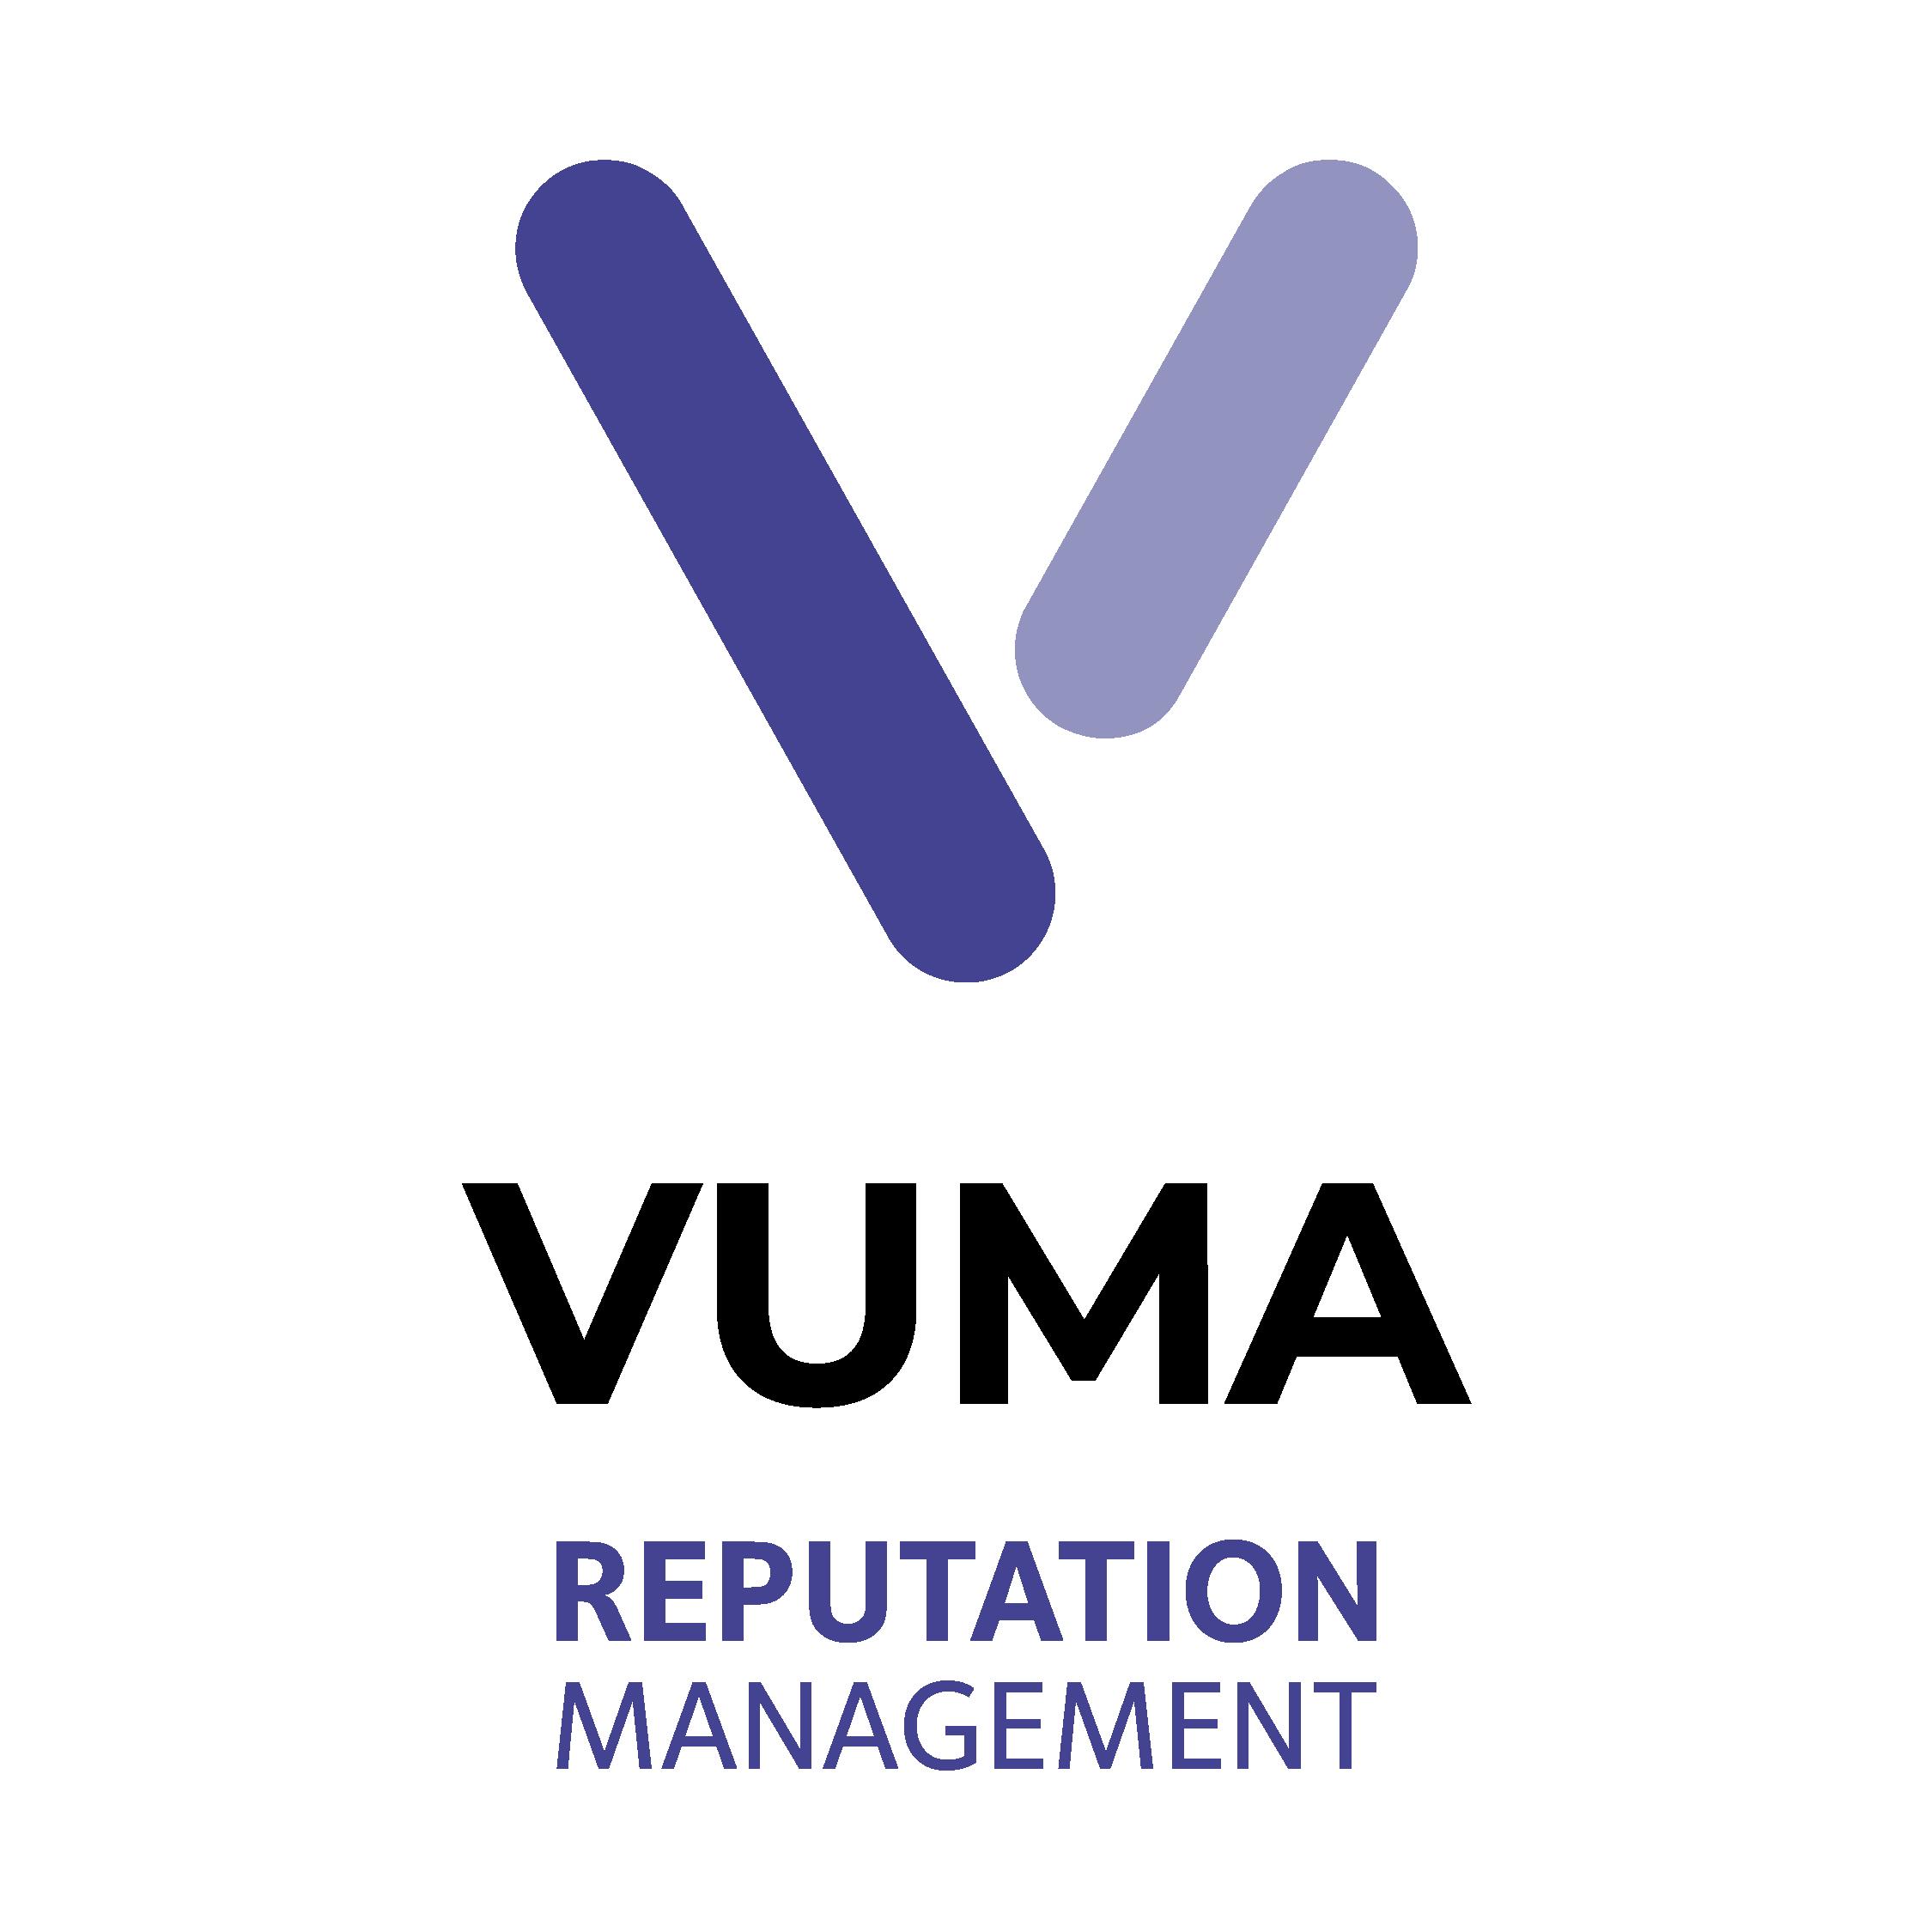 Vuma Reputation Management